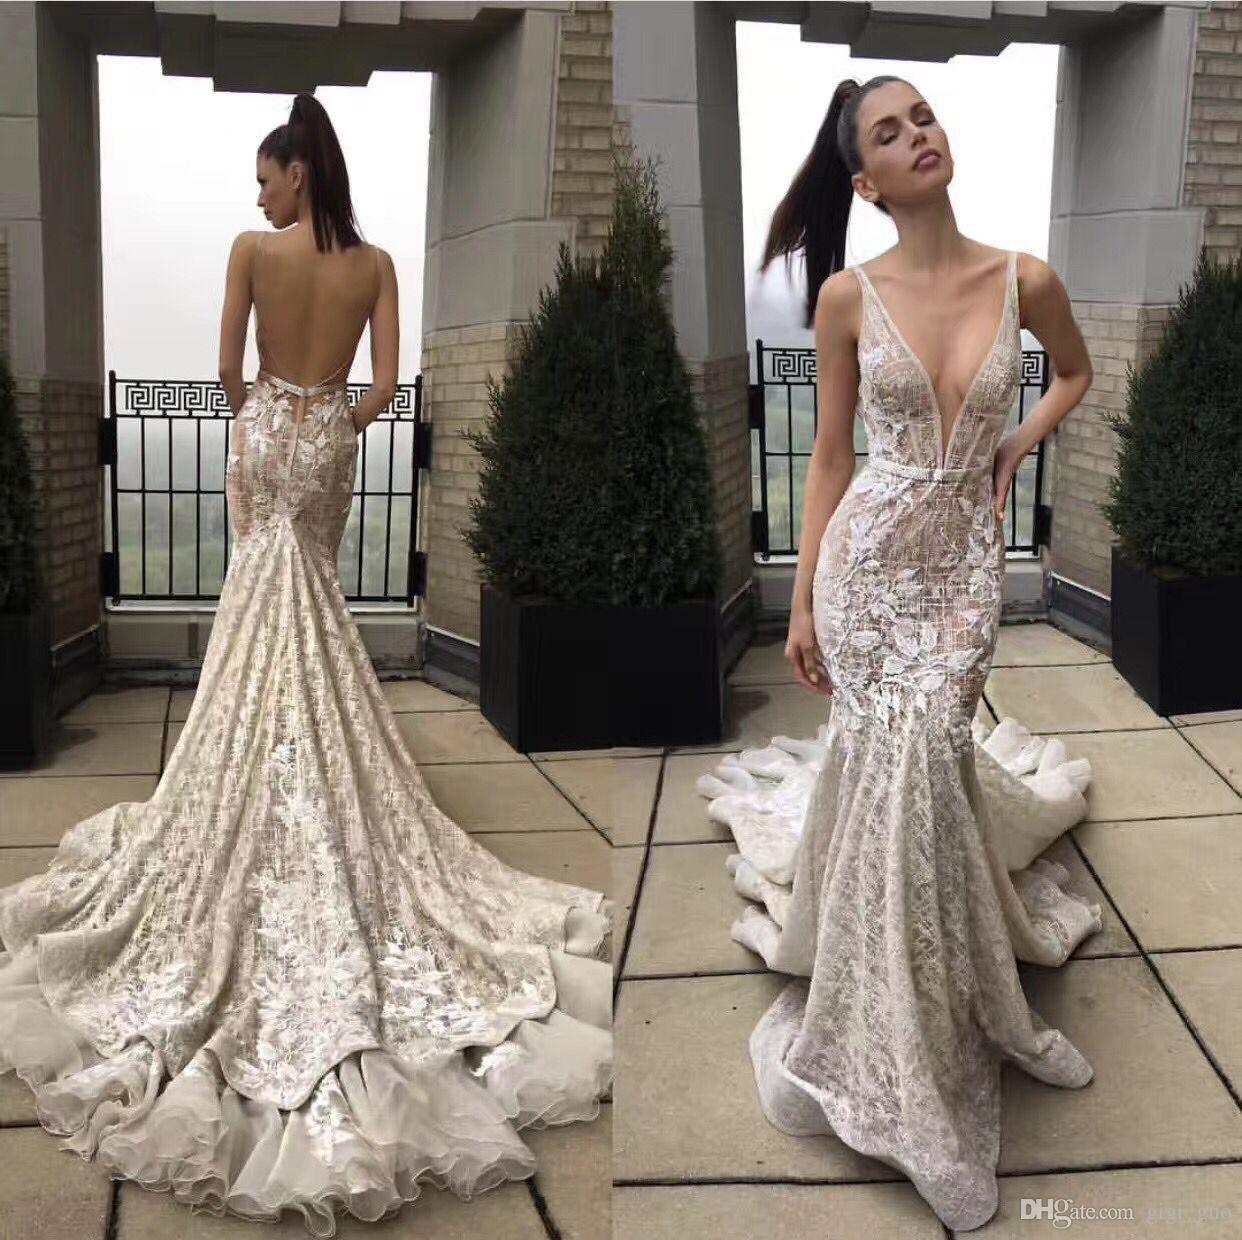 Simple Wedding Dress Europe: 2019 2017 European And European Wedding Dress Fabric Mesh